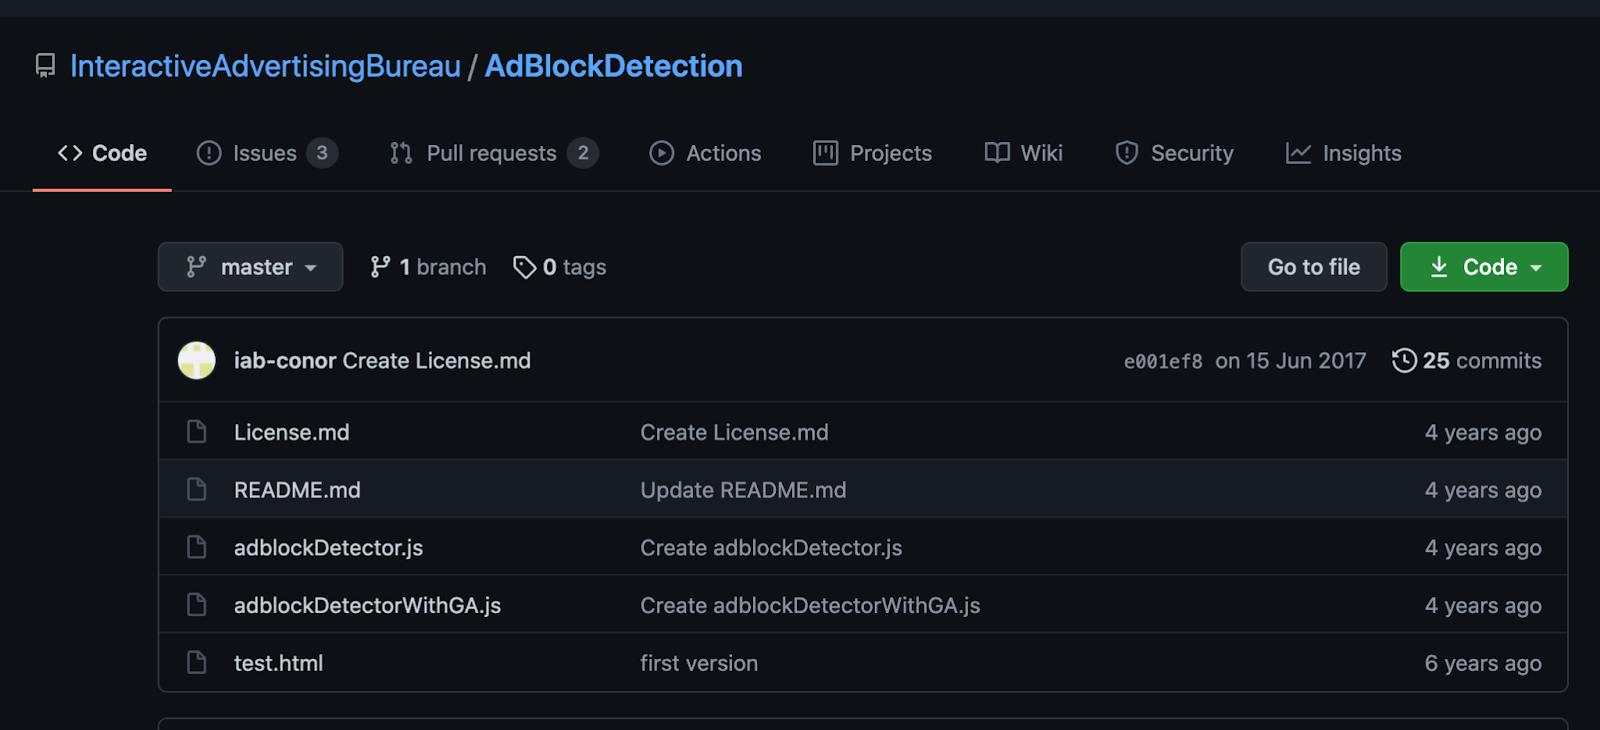 lnteractive Advertising Bureau AdBlock Detection GitHub page